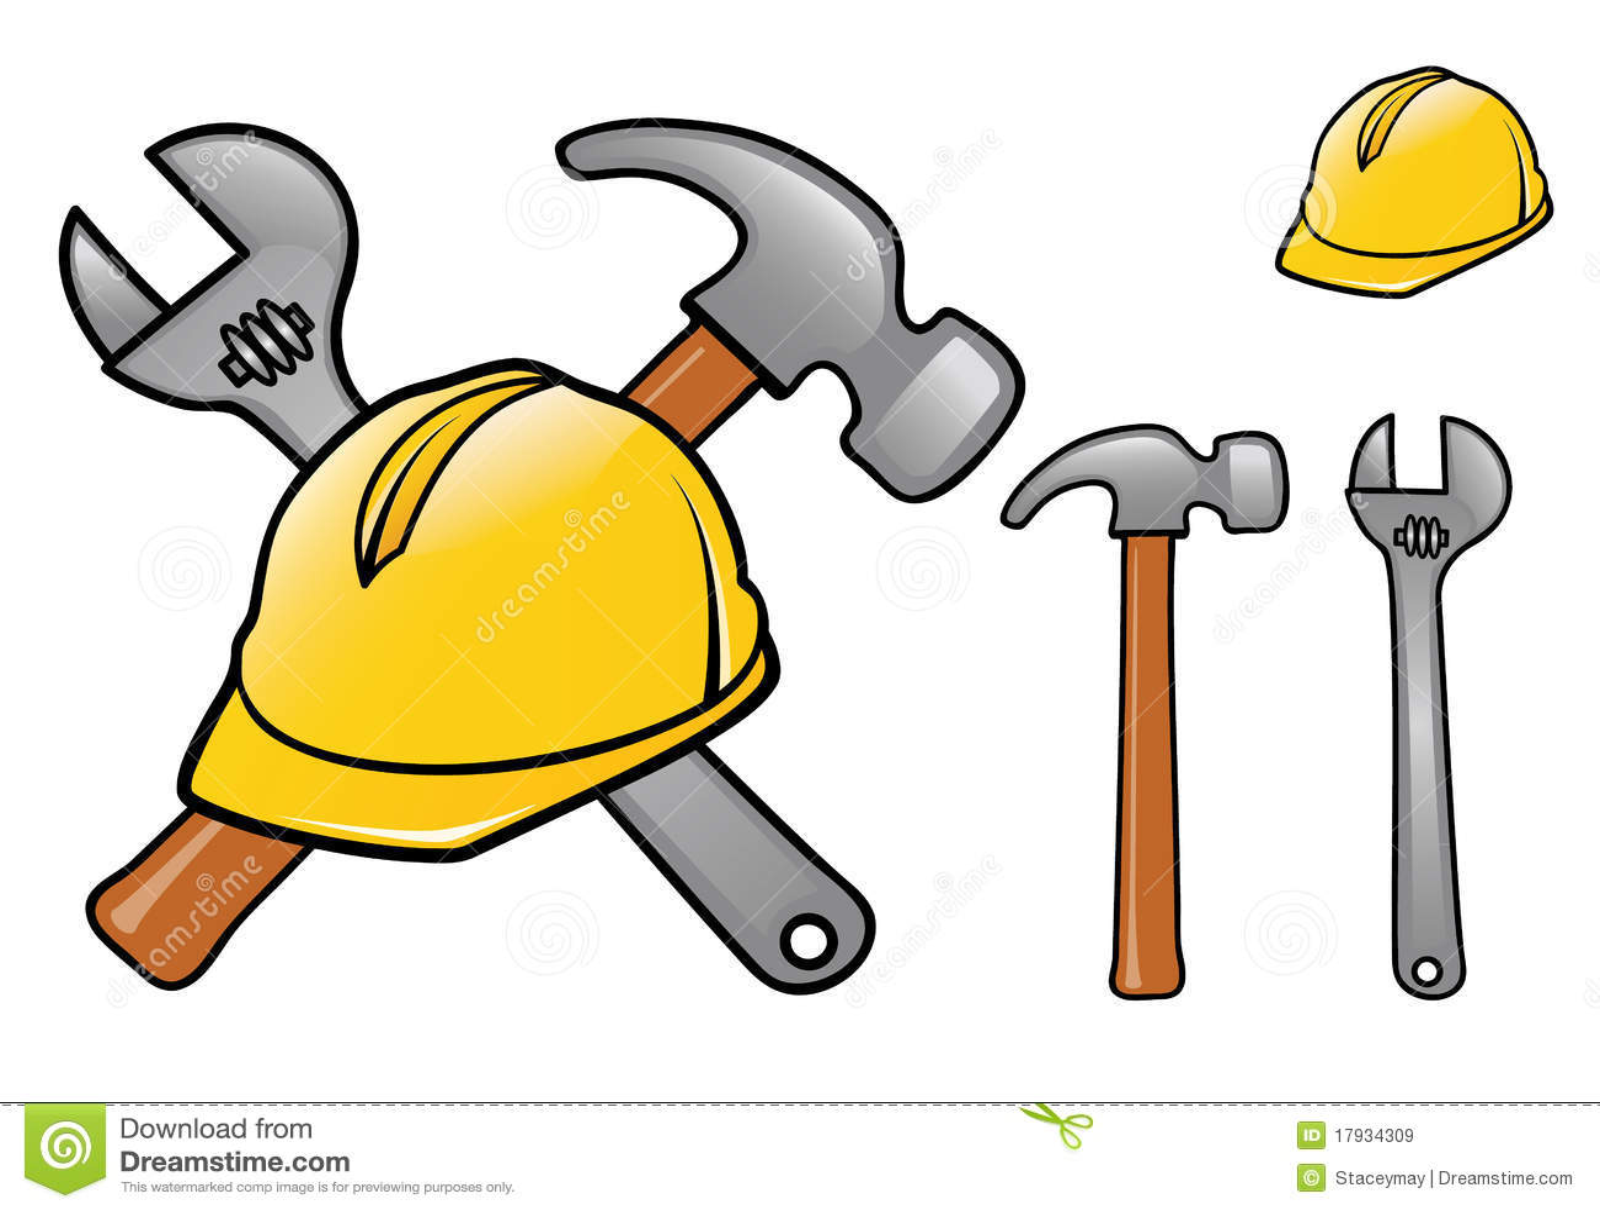 Logo Design Coffs Harbour also 11772632 as well 548805904565643010 furthermore Stanley Black Decker Dewalt also Construction Letterheads Templates Designs Builders Letterhead Template. on plumbing company logos